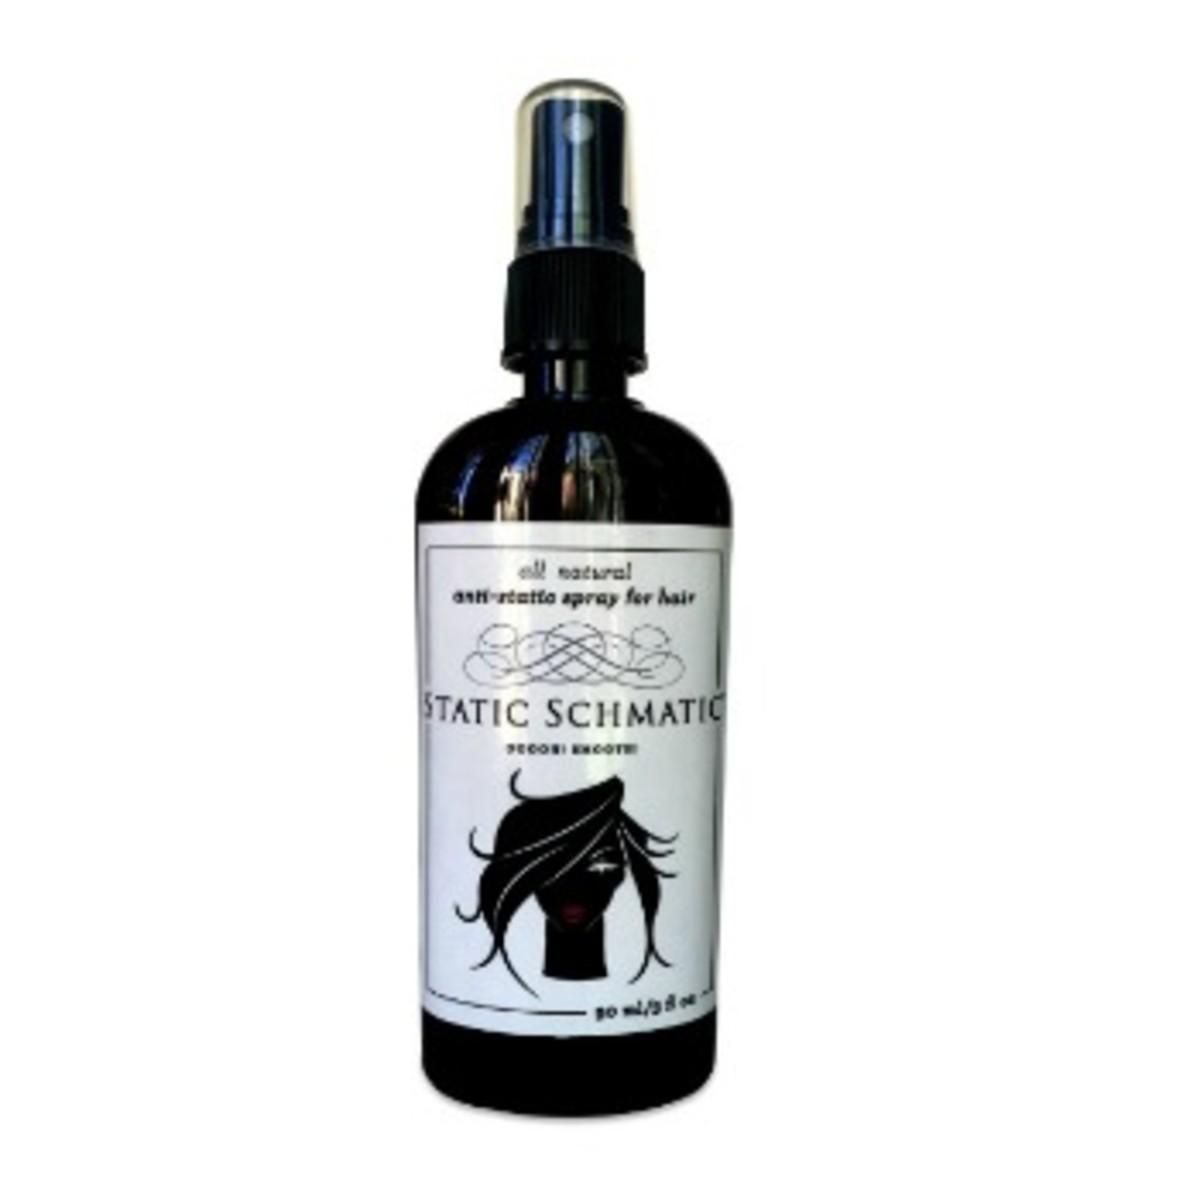 Static Schmatic Anti-Static Spray for Hair